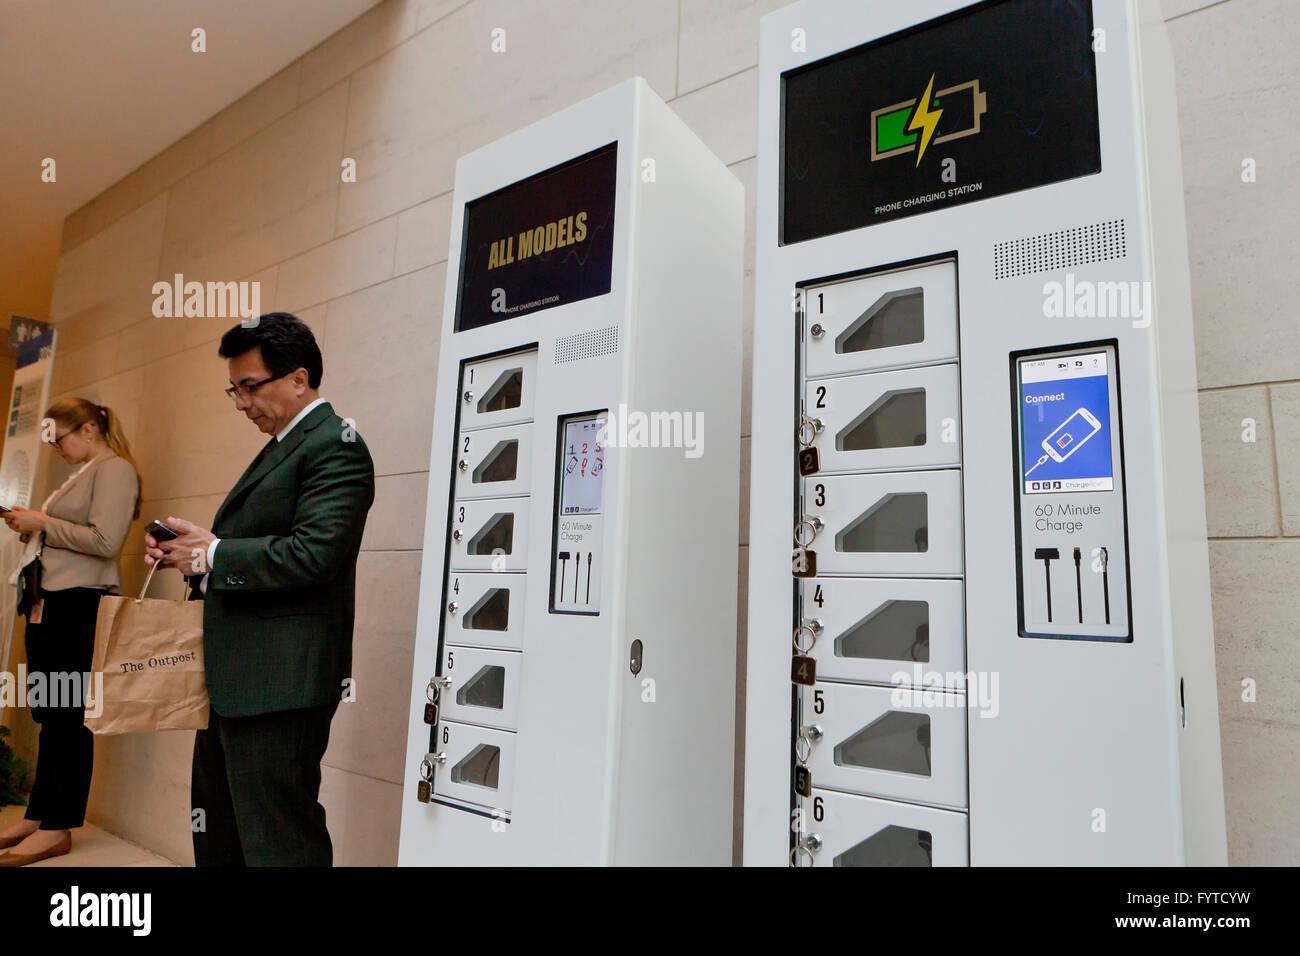 Mobile phone charging station usa stock photo royalty Cell phone charging station